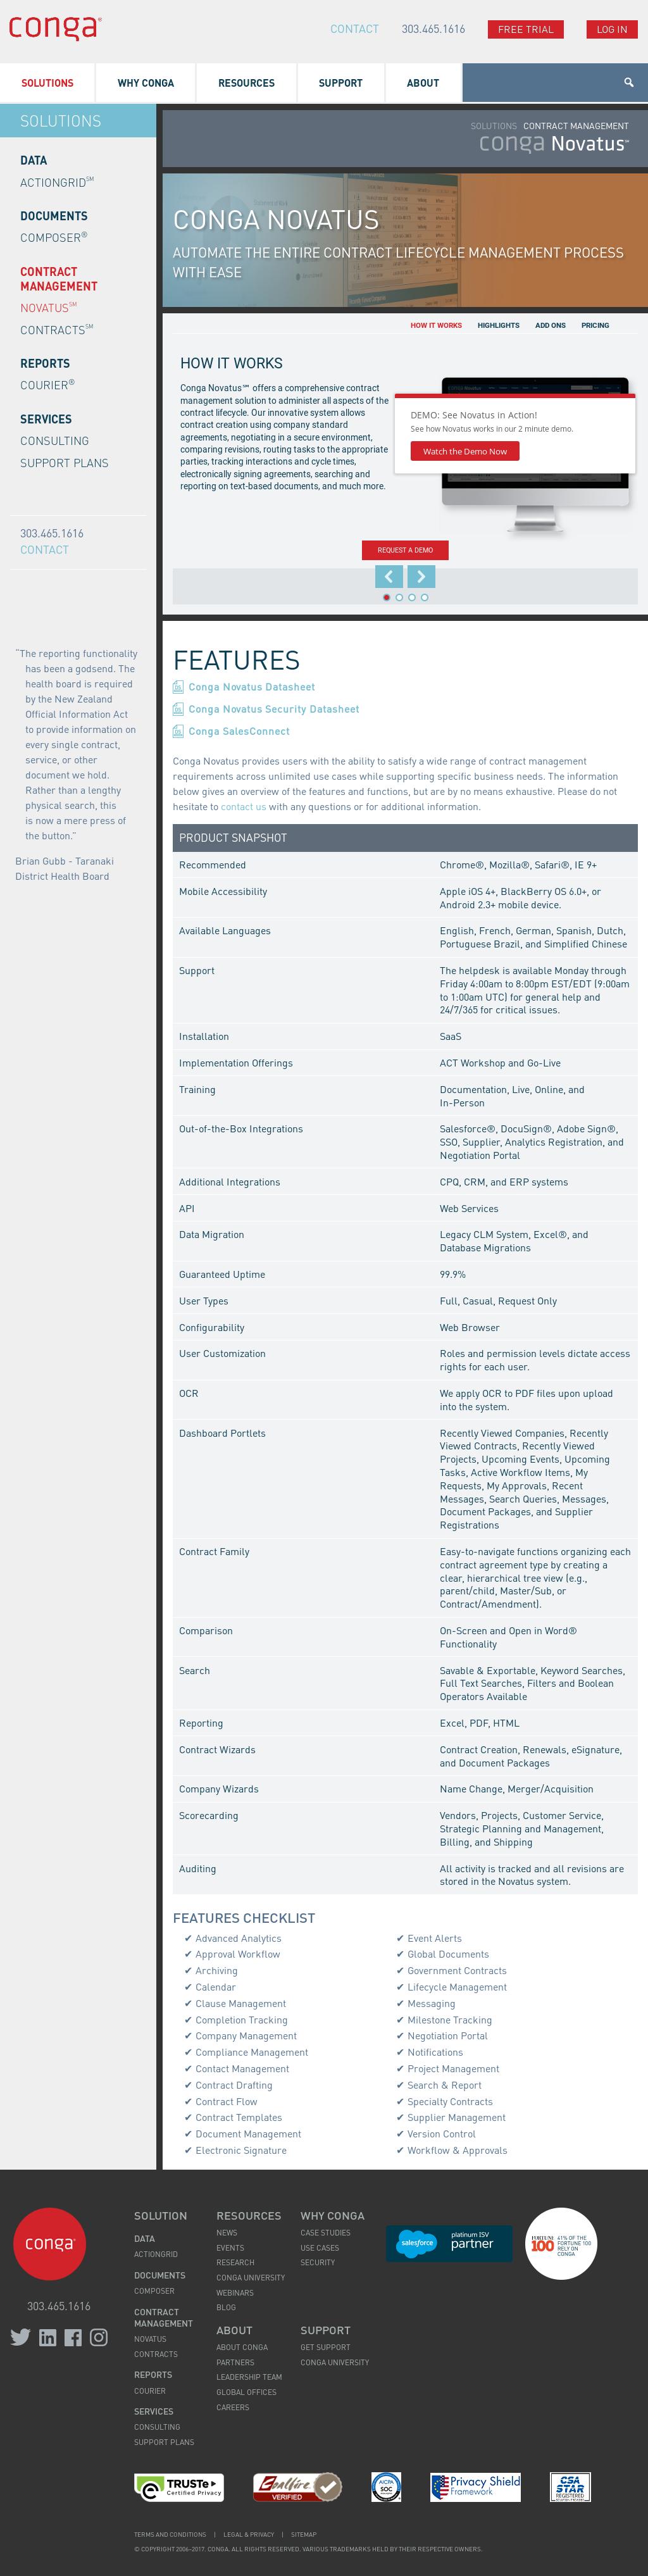 Novatus Competitors, Revenue and Employees - Owler Company